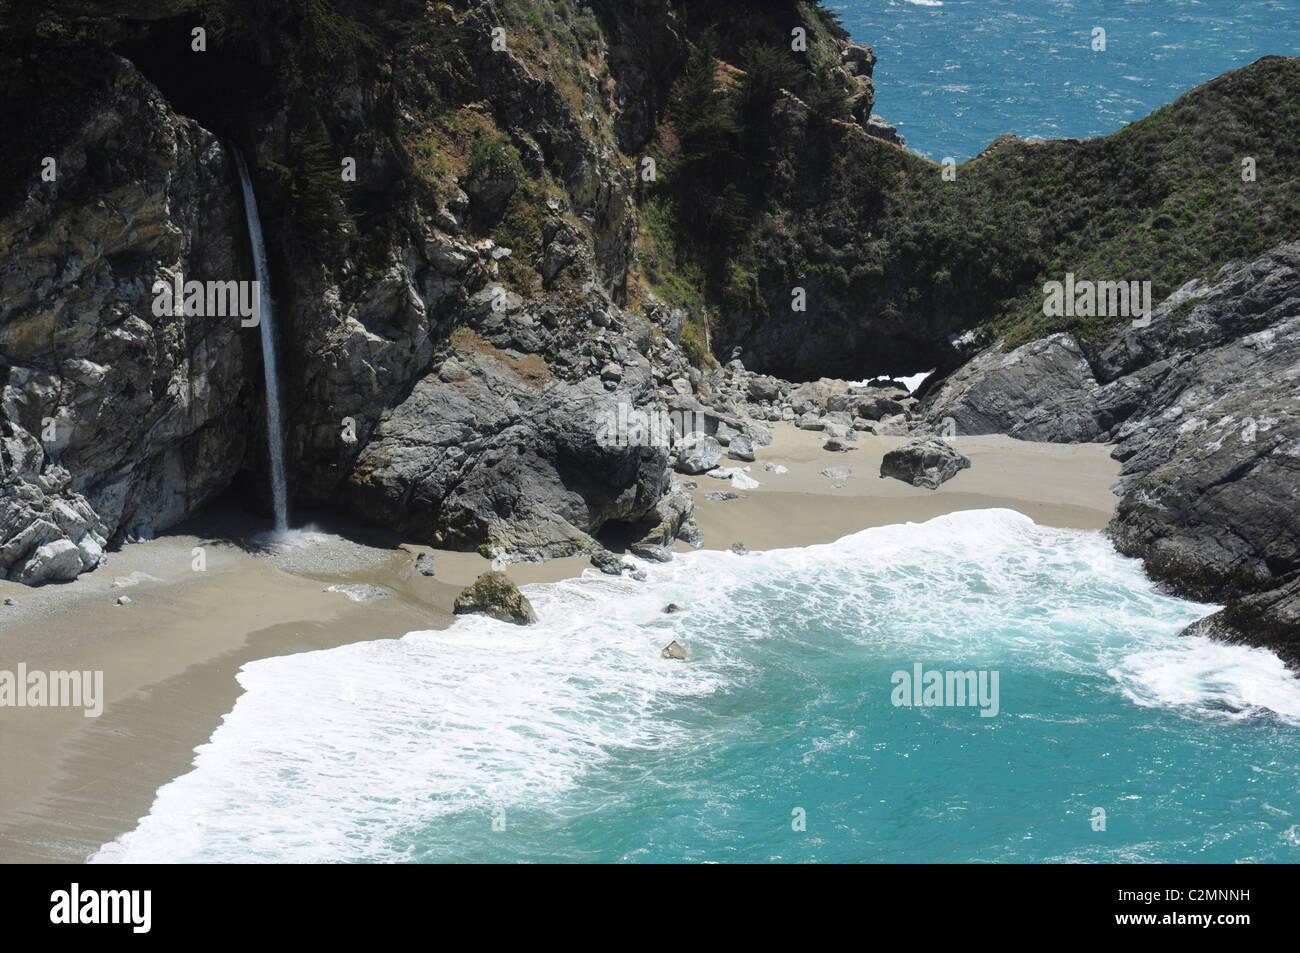 McWay Falls on the Pacific coast, Julia Pfeiffer Burns State Park, Big Sur area, California, USA - Stock Image